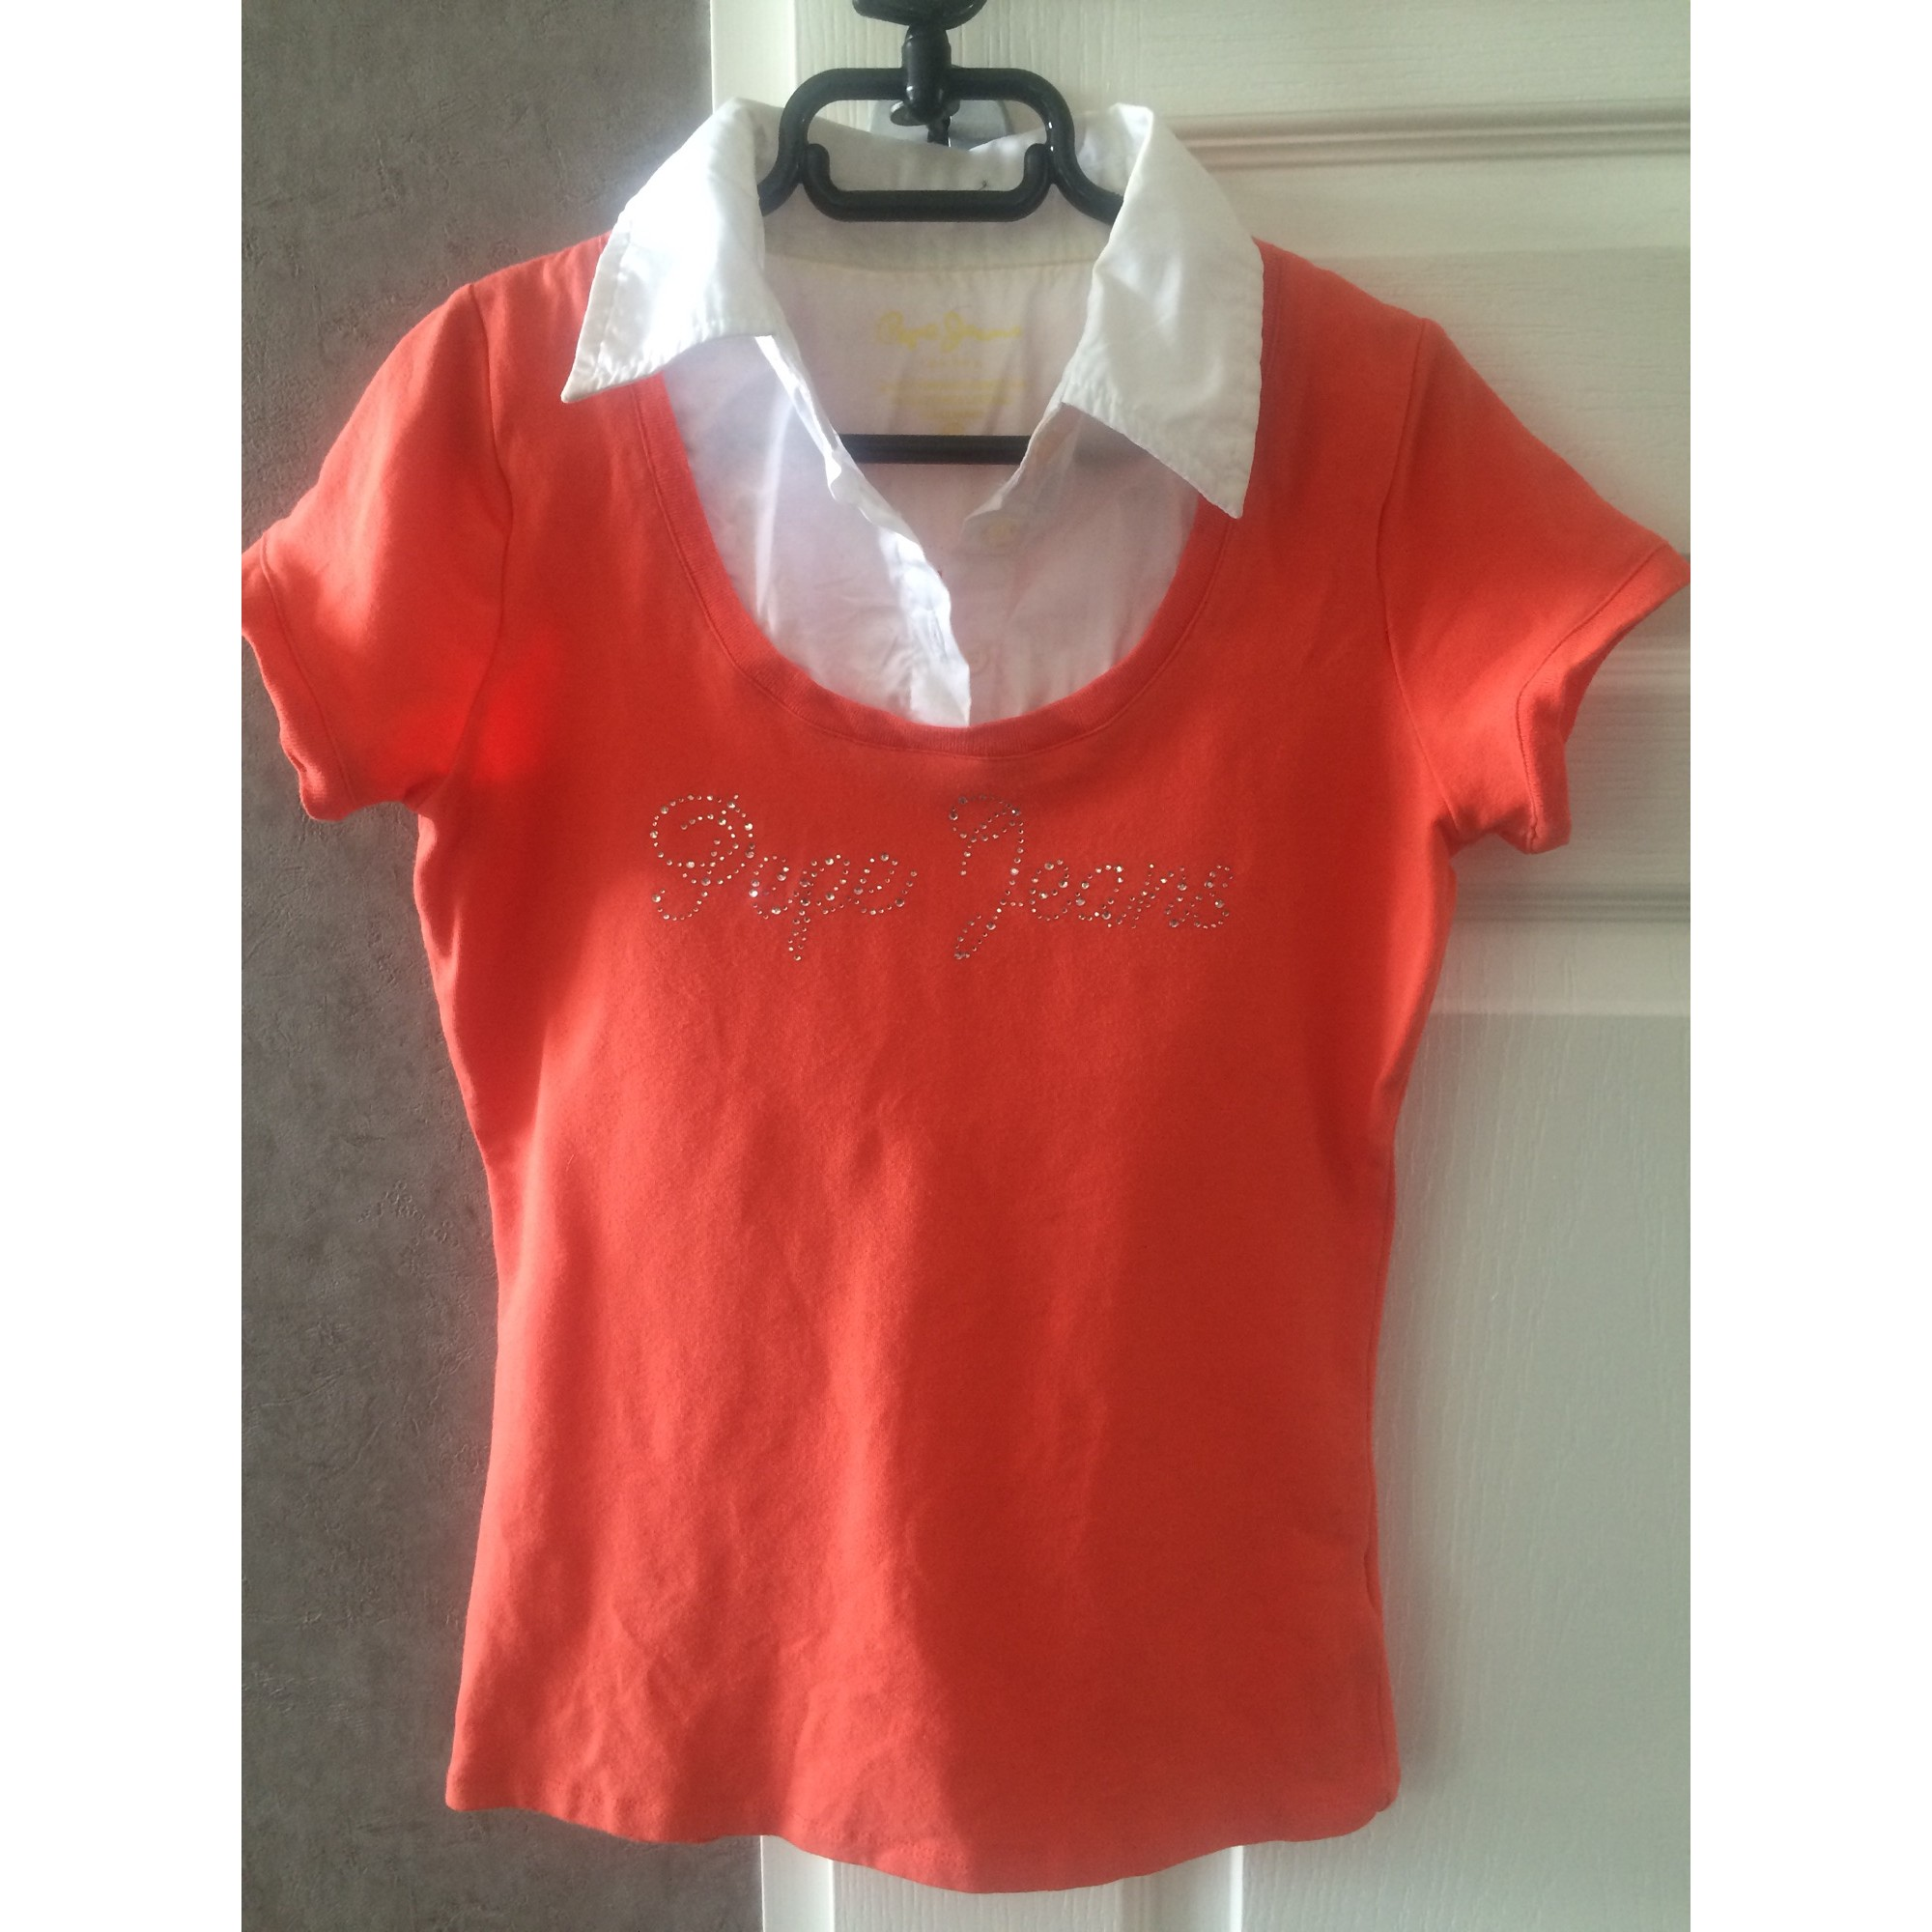 Top, Tee-shirt PEPE JEANS coton orange 13-14 ans